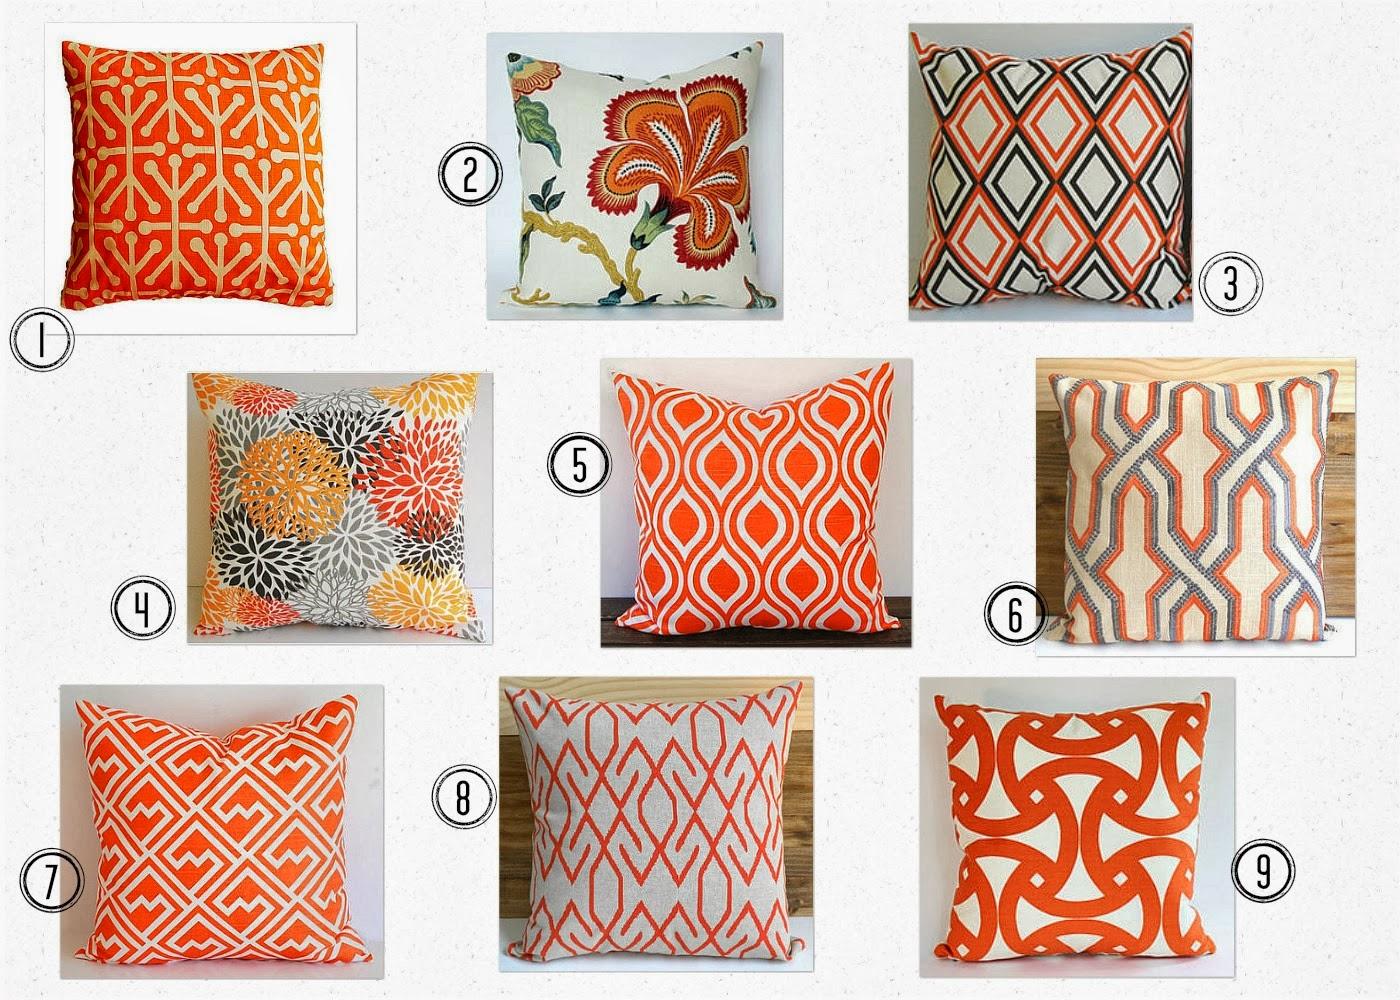 orange photo of large design sofaorange tan pillow sofa and red toss pillows for throw pinterest mediterranean size pillowsorange silk inspirations search google